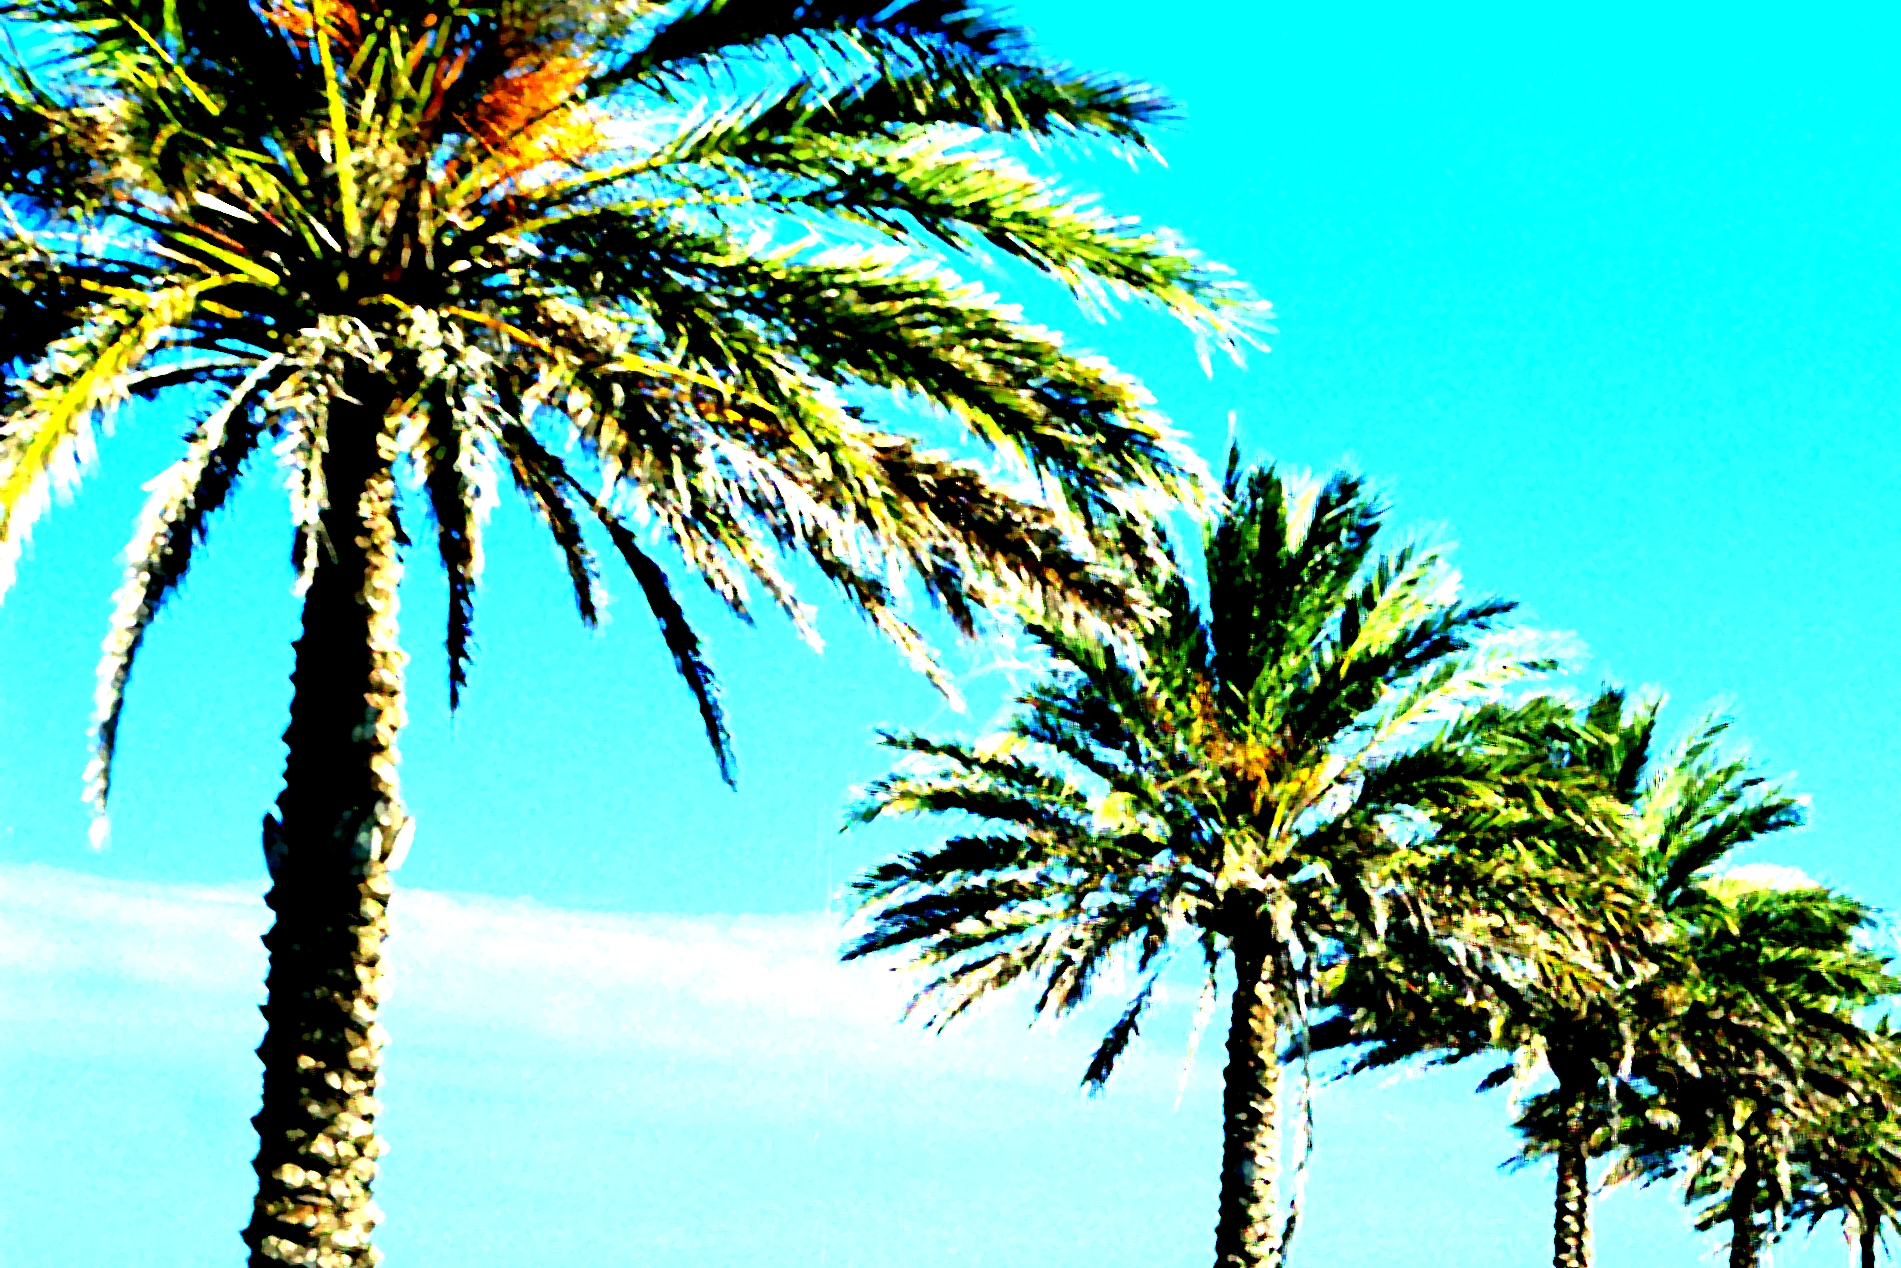 stussy wallpaper palm trees - photo #48